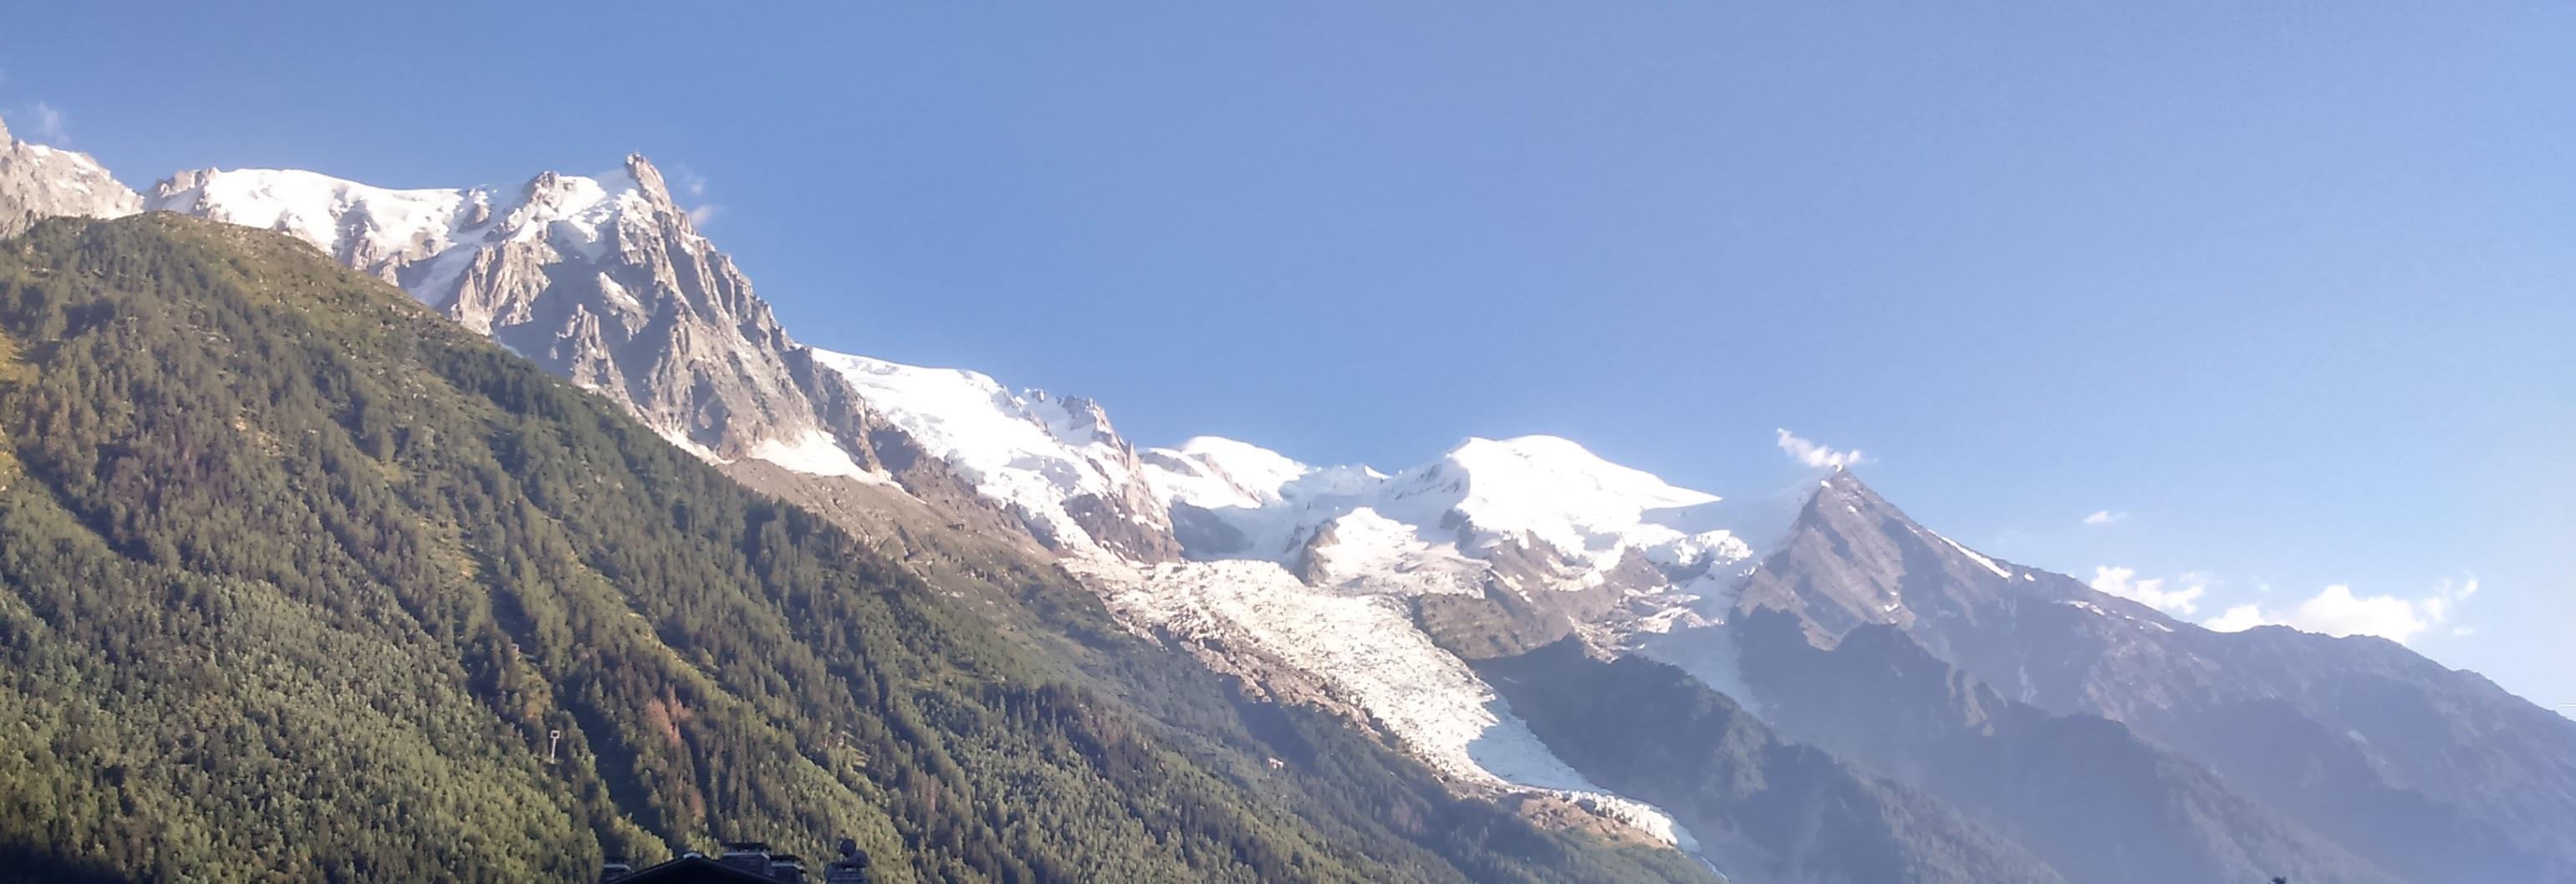 dsc_1769-mont-blanc